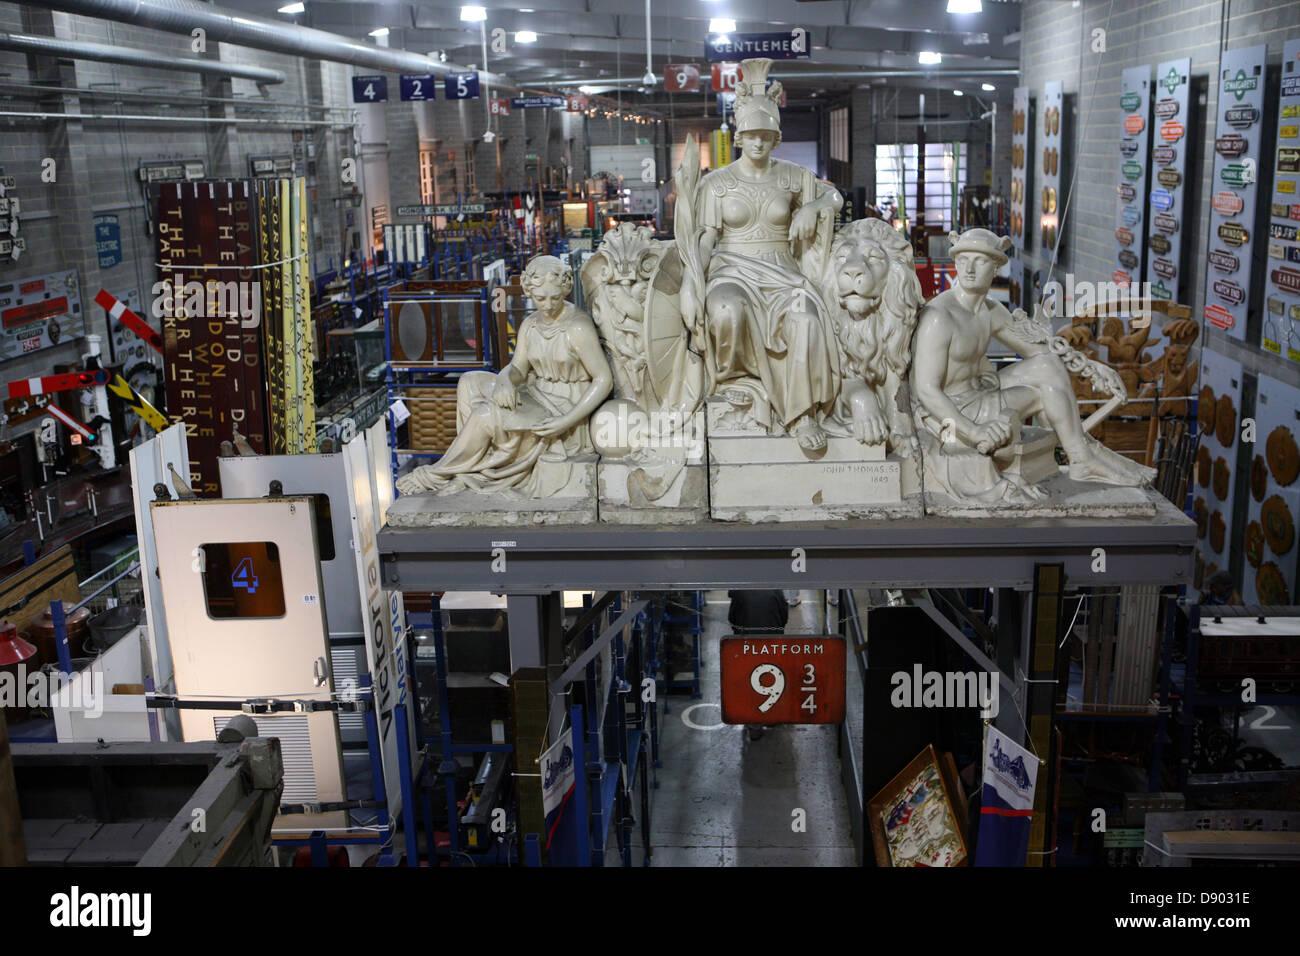 Statuary in National Rail museum York - Stock Image